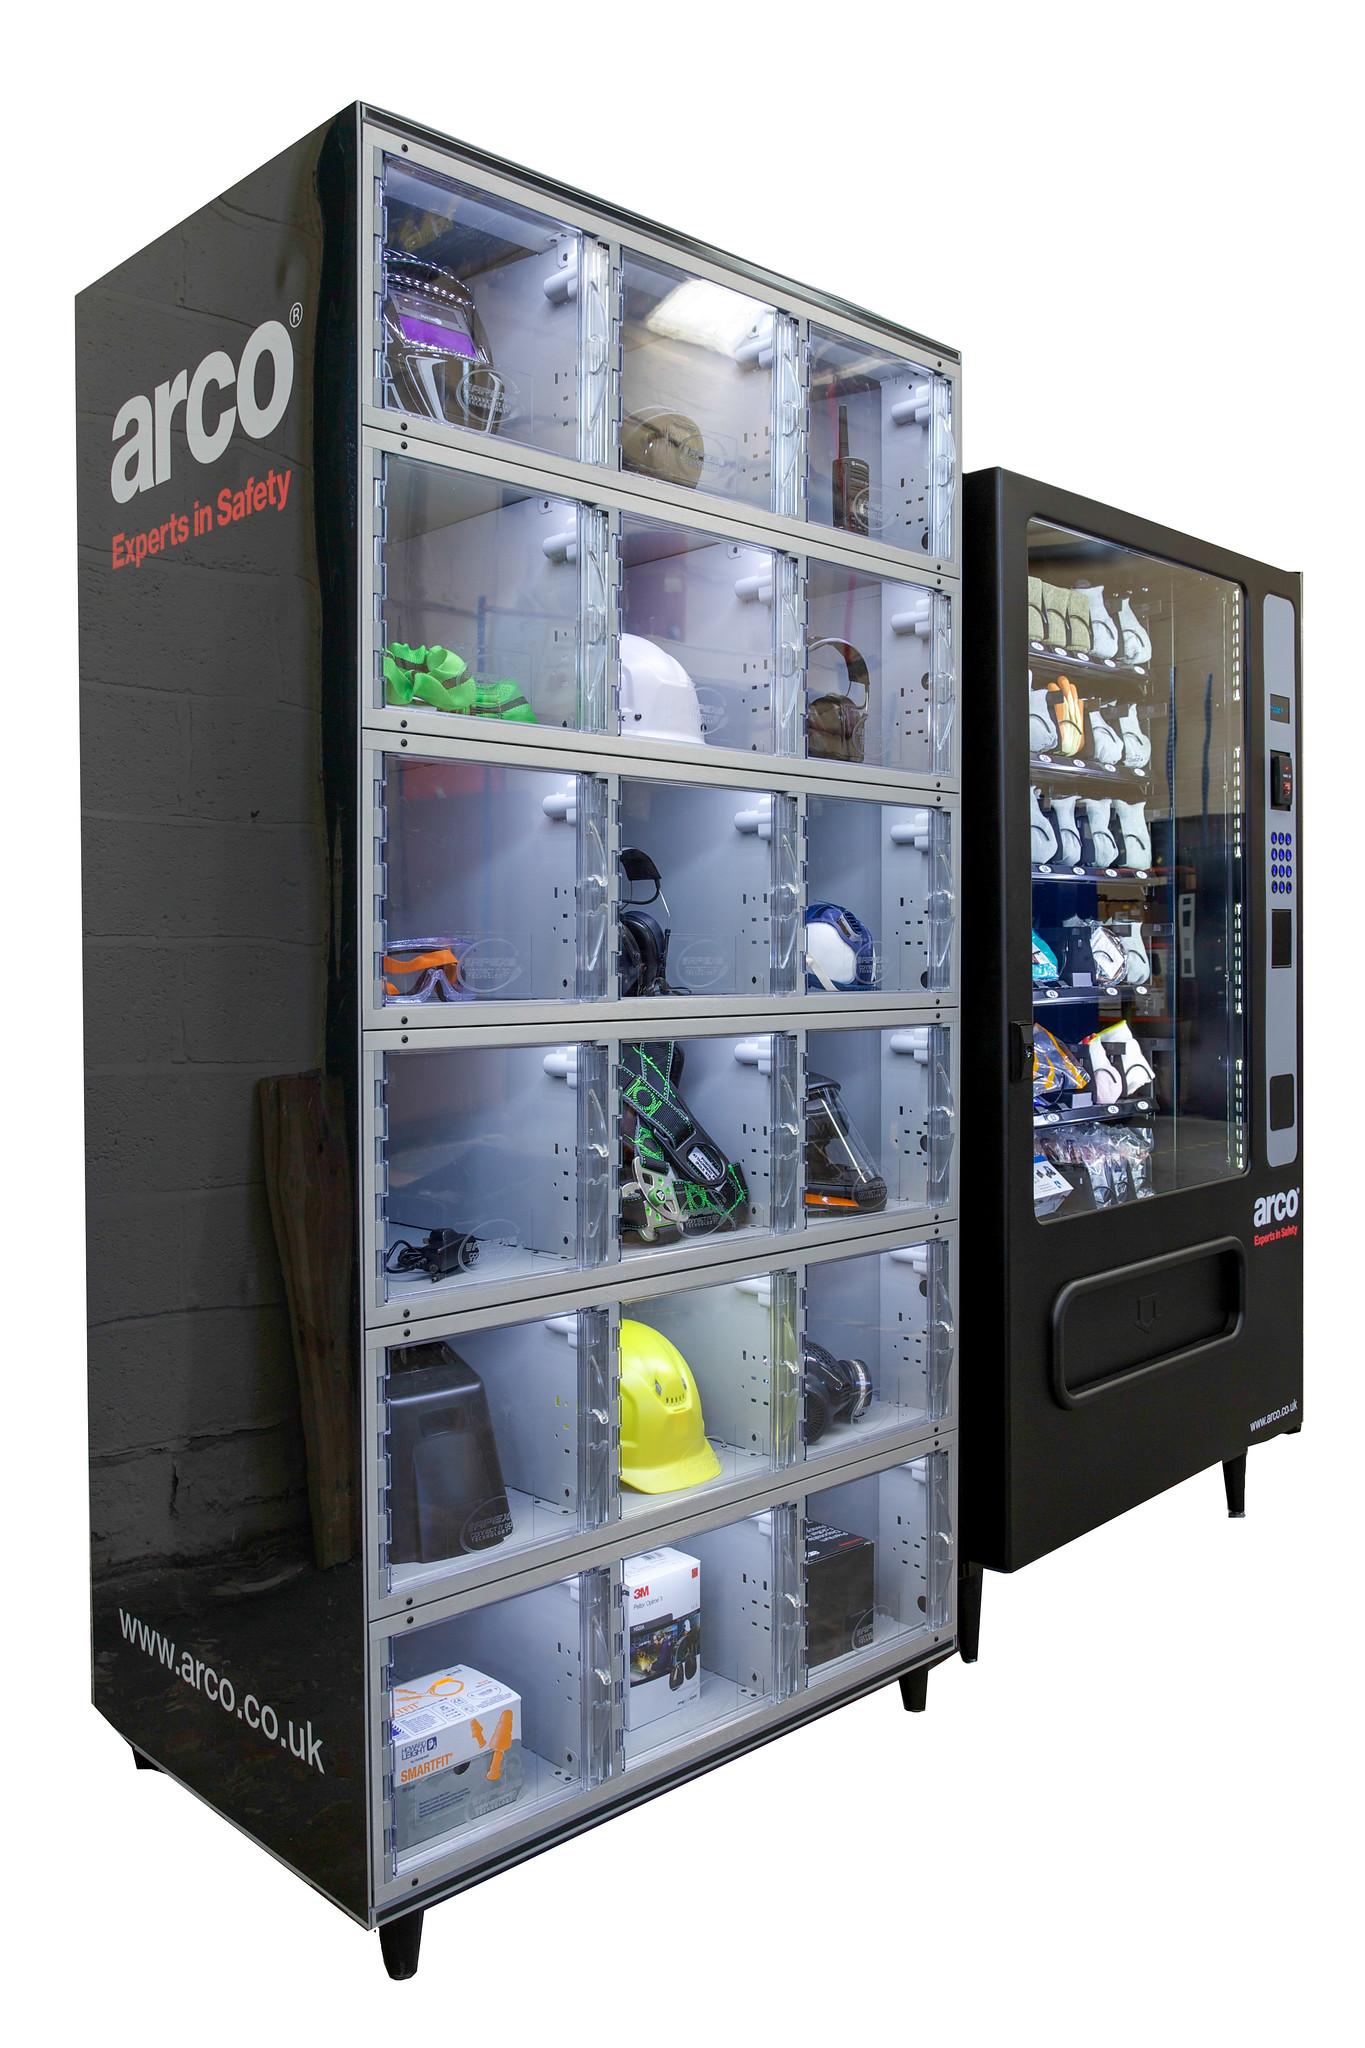 ARCO VENDING MACHINES